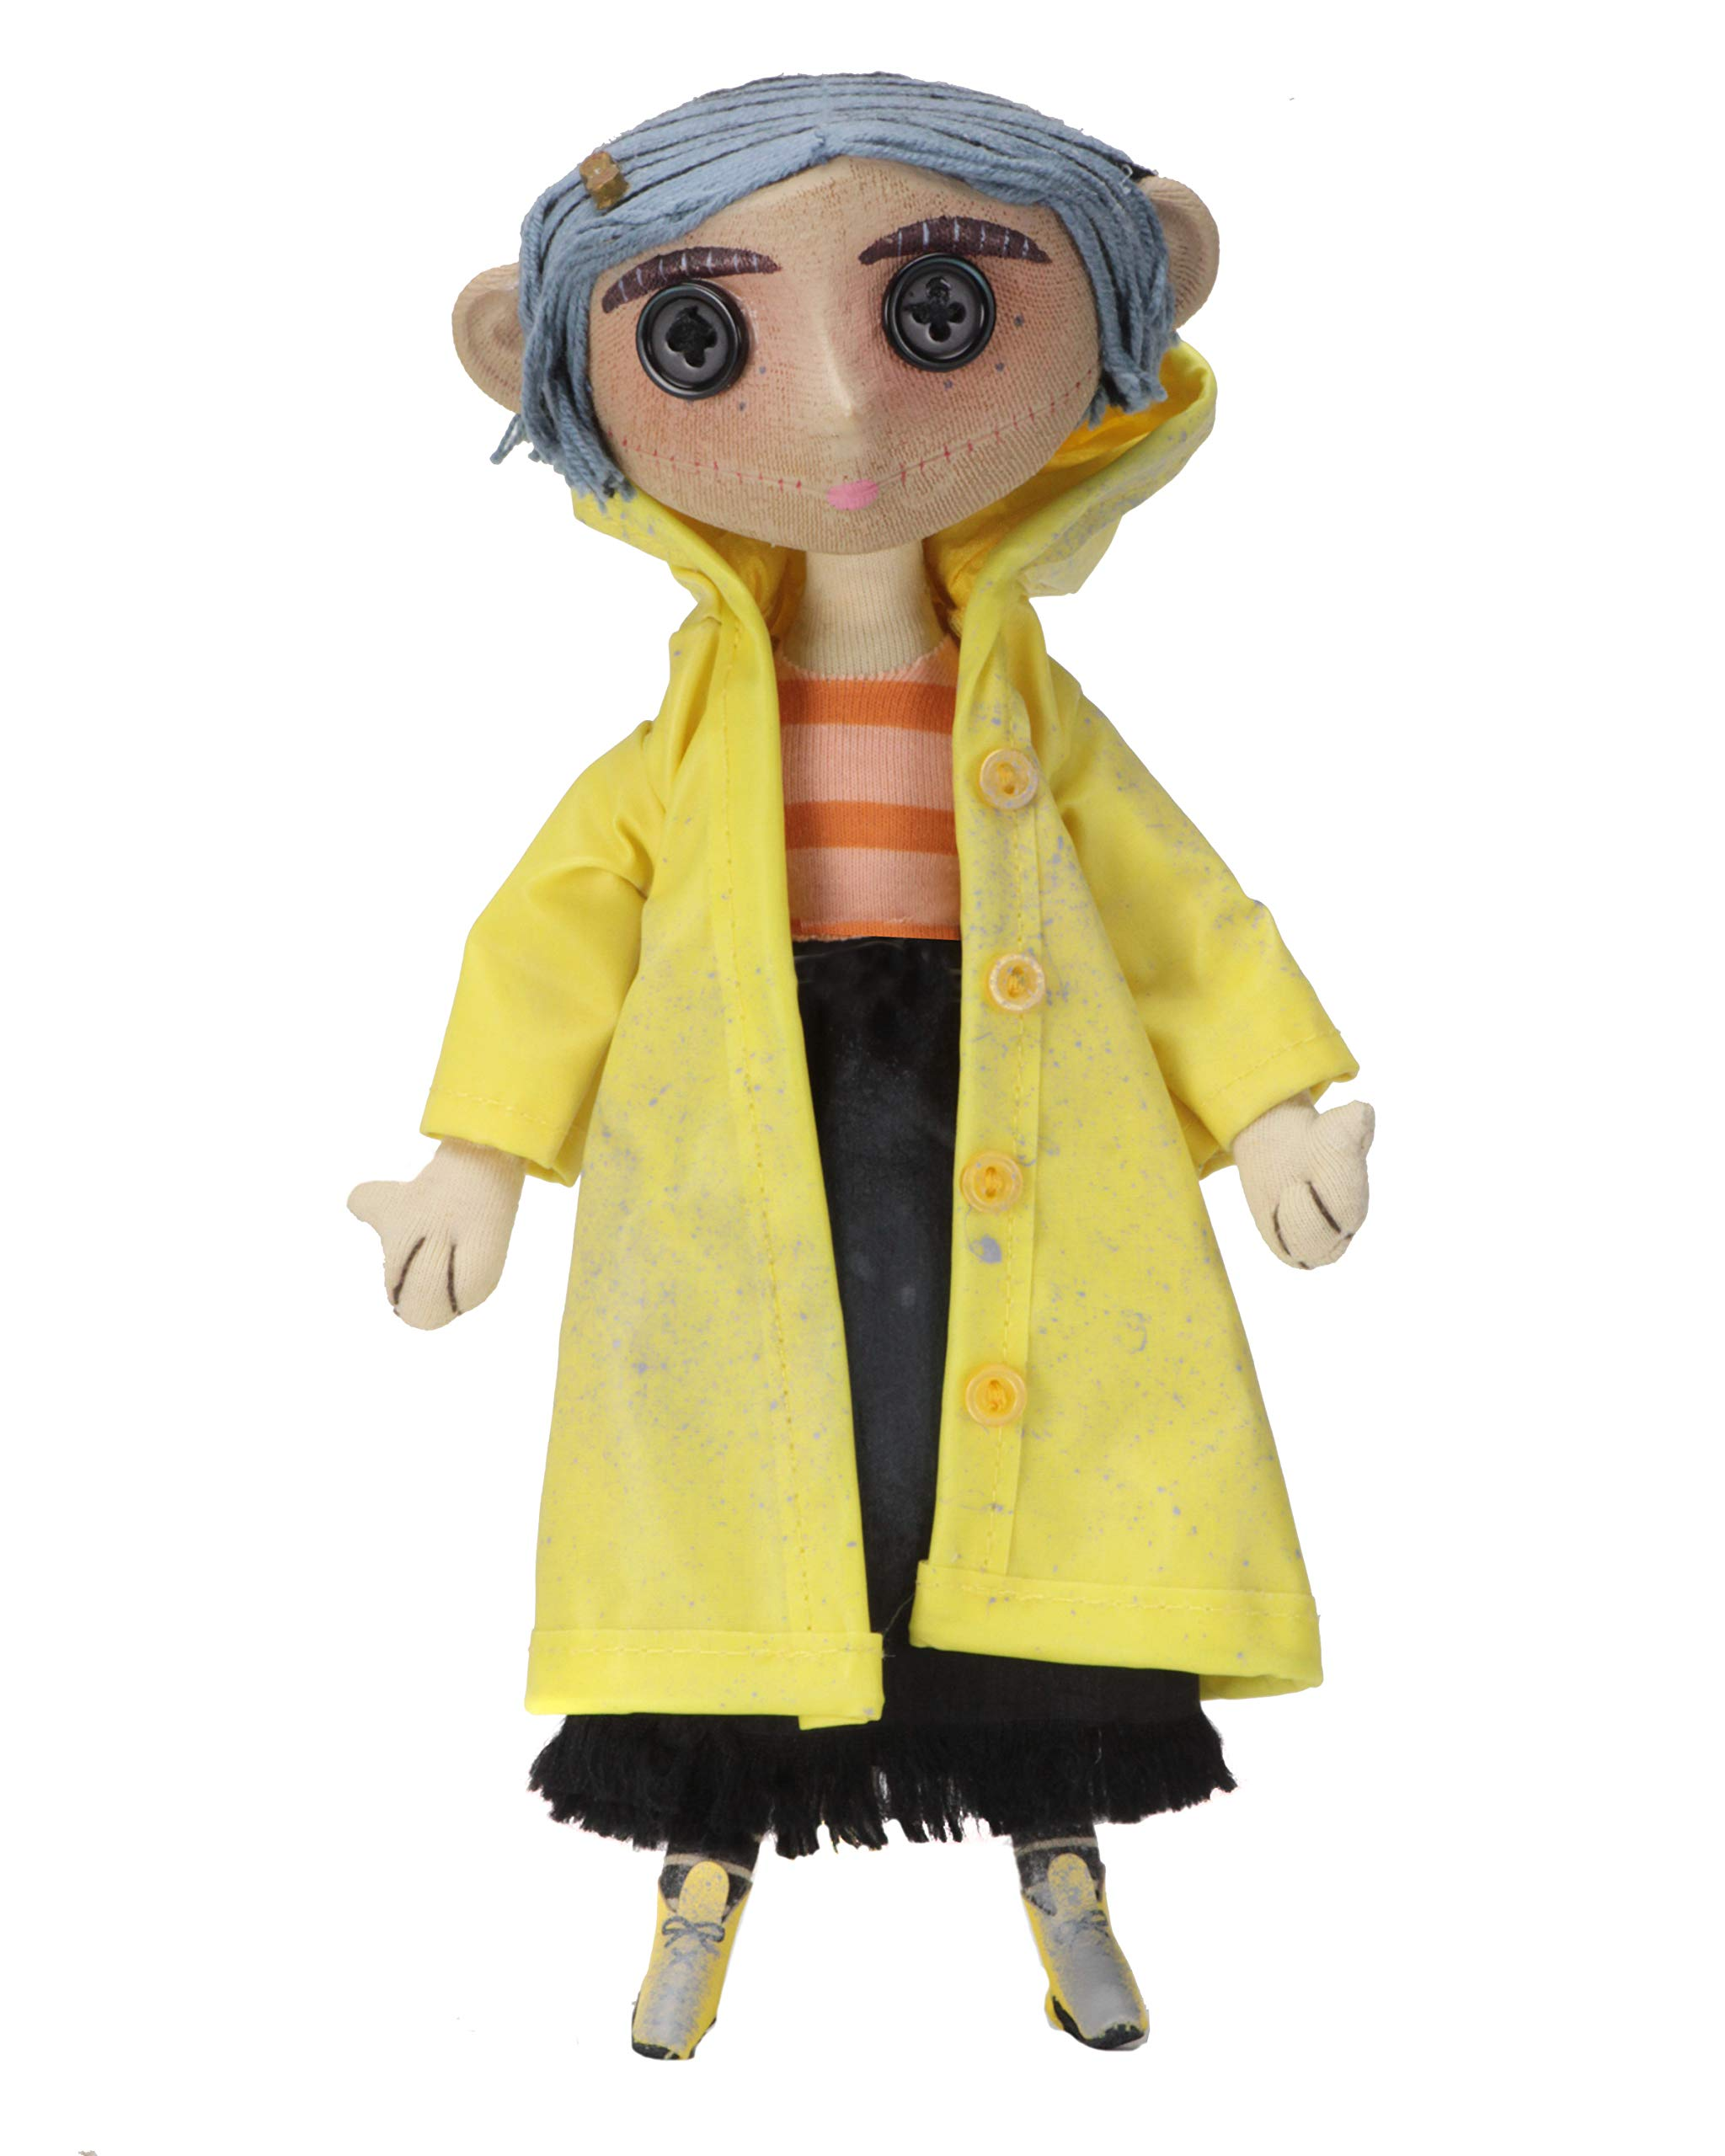 "NECA - Coraline - Prop Replica 10"" Coraline Doll"